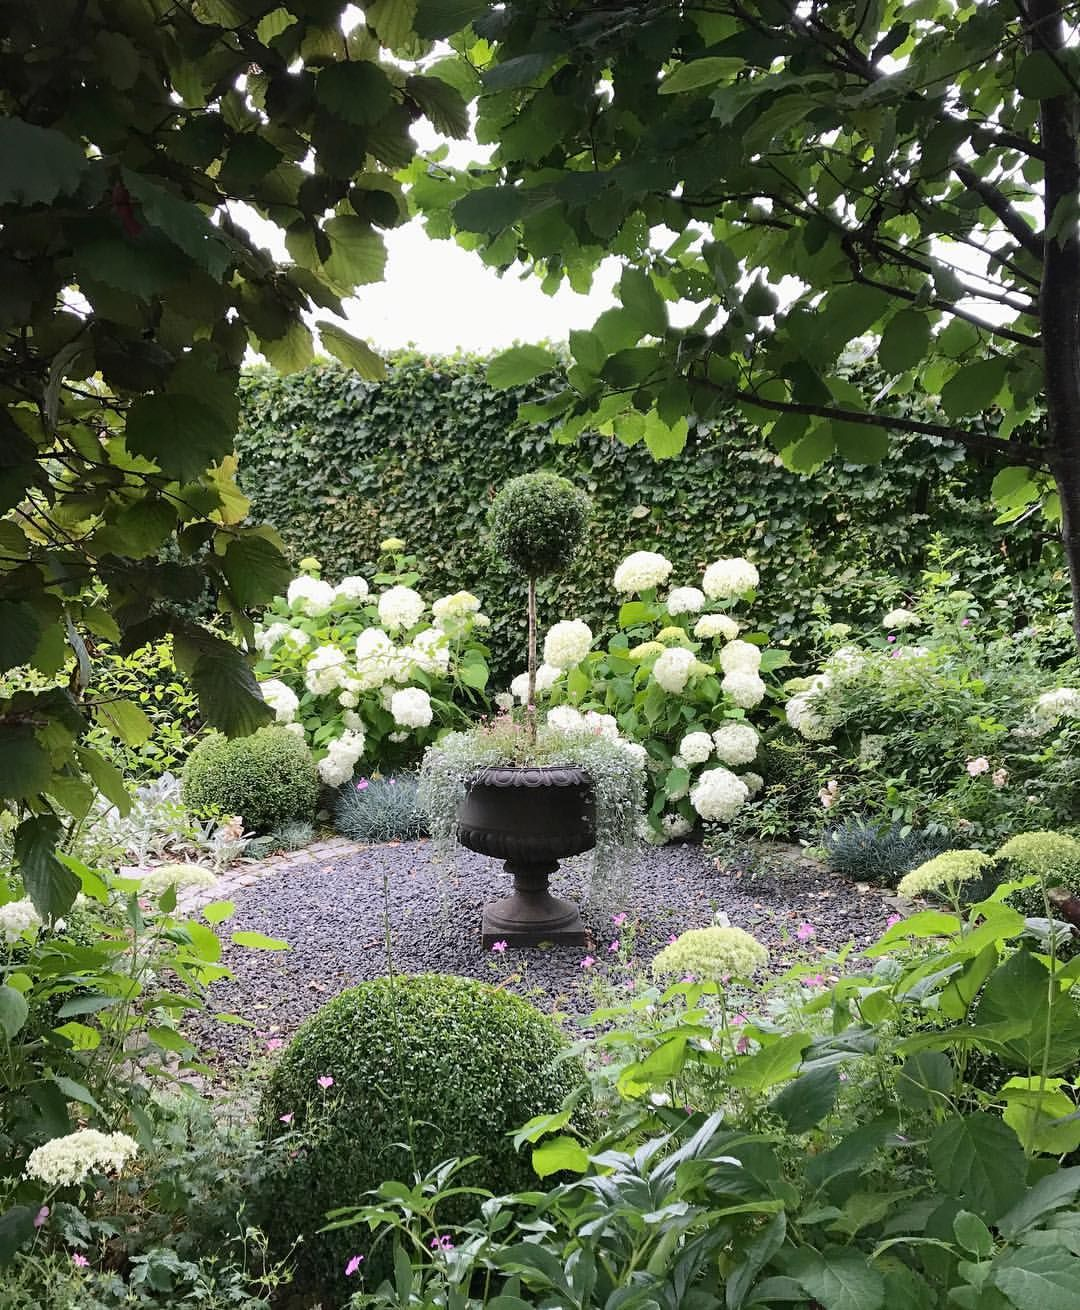 Pin de marianette morales en the secret garden pinterest for Jardines murales